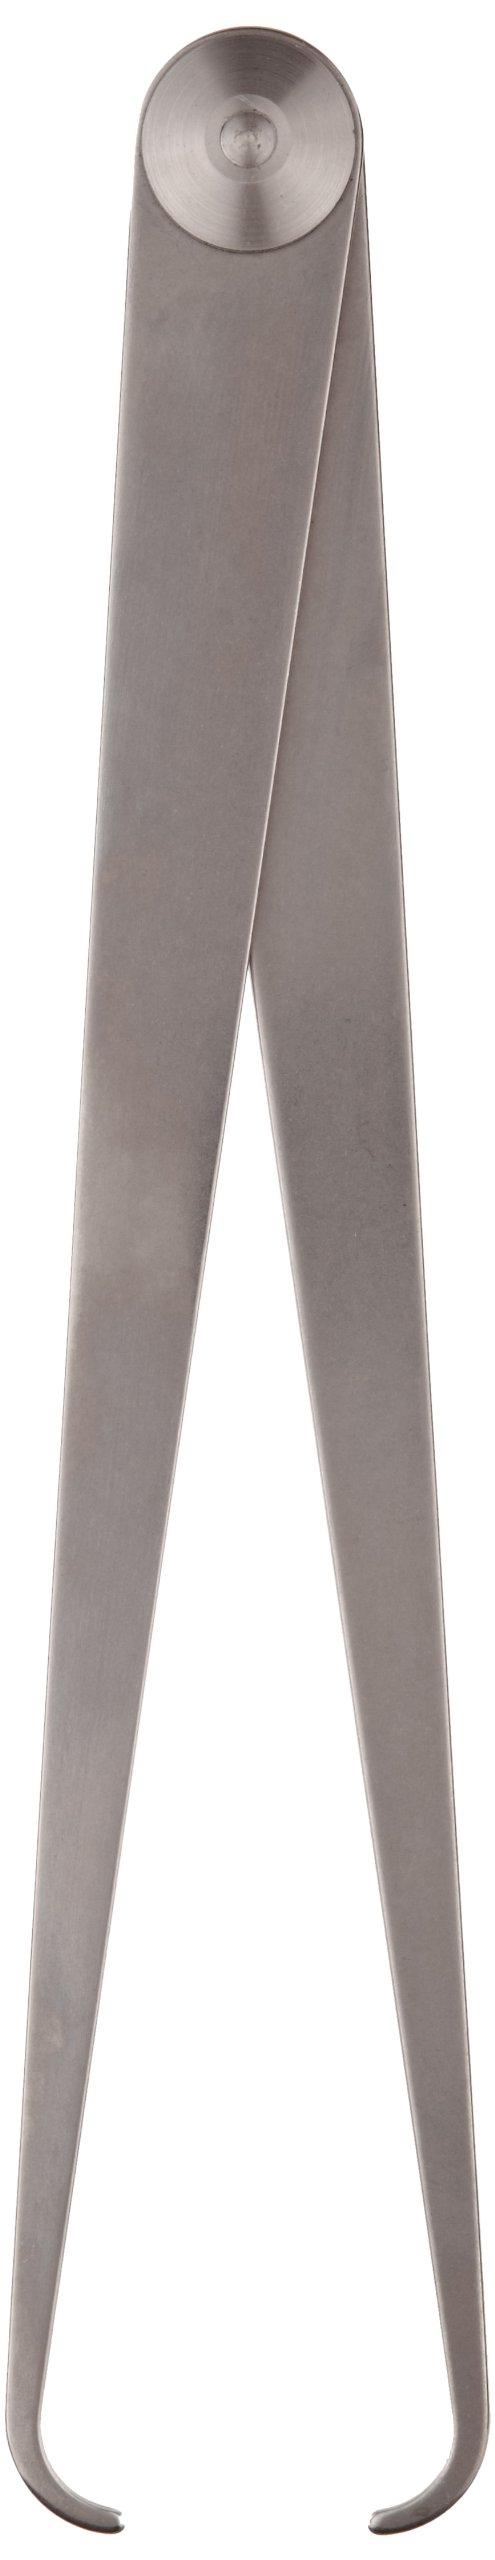 Starrett 27-12 Inside Joint Caliper, Steel, Flat Leg, 0-12'' Range